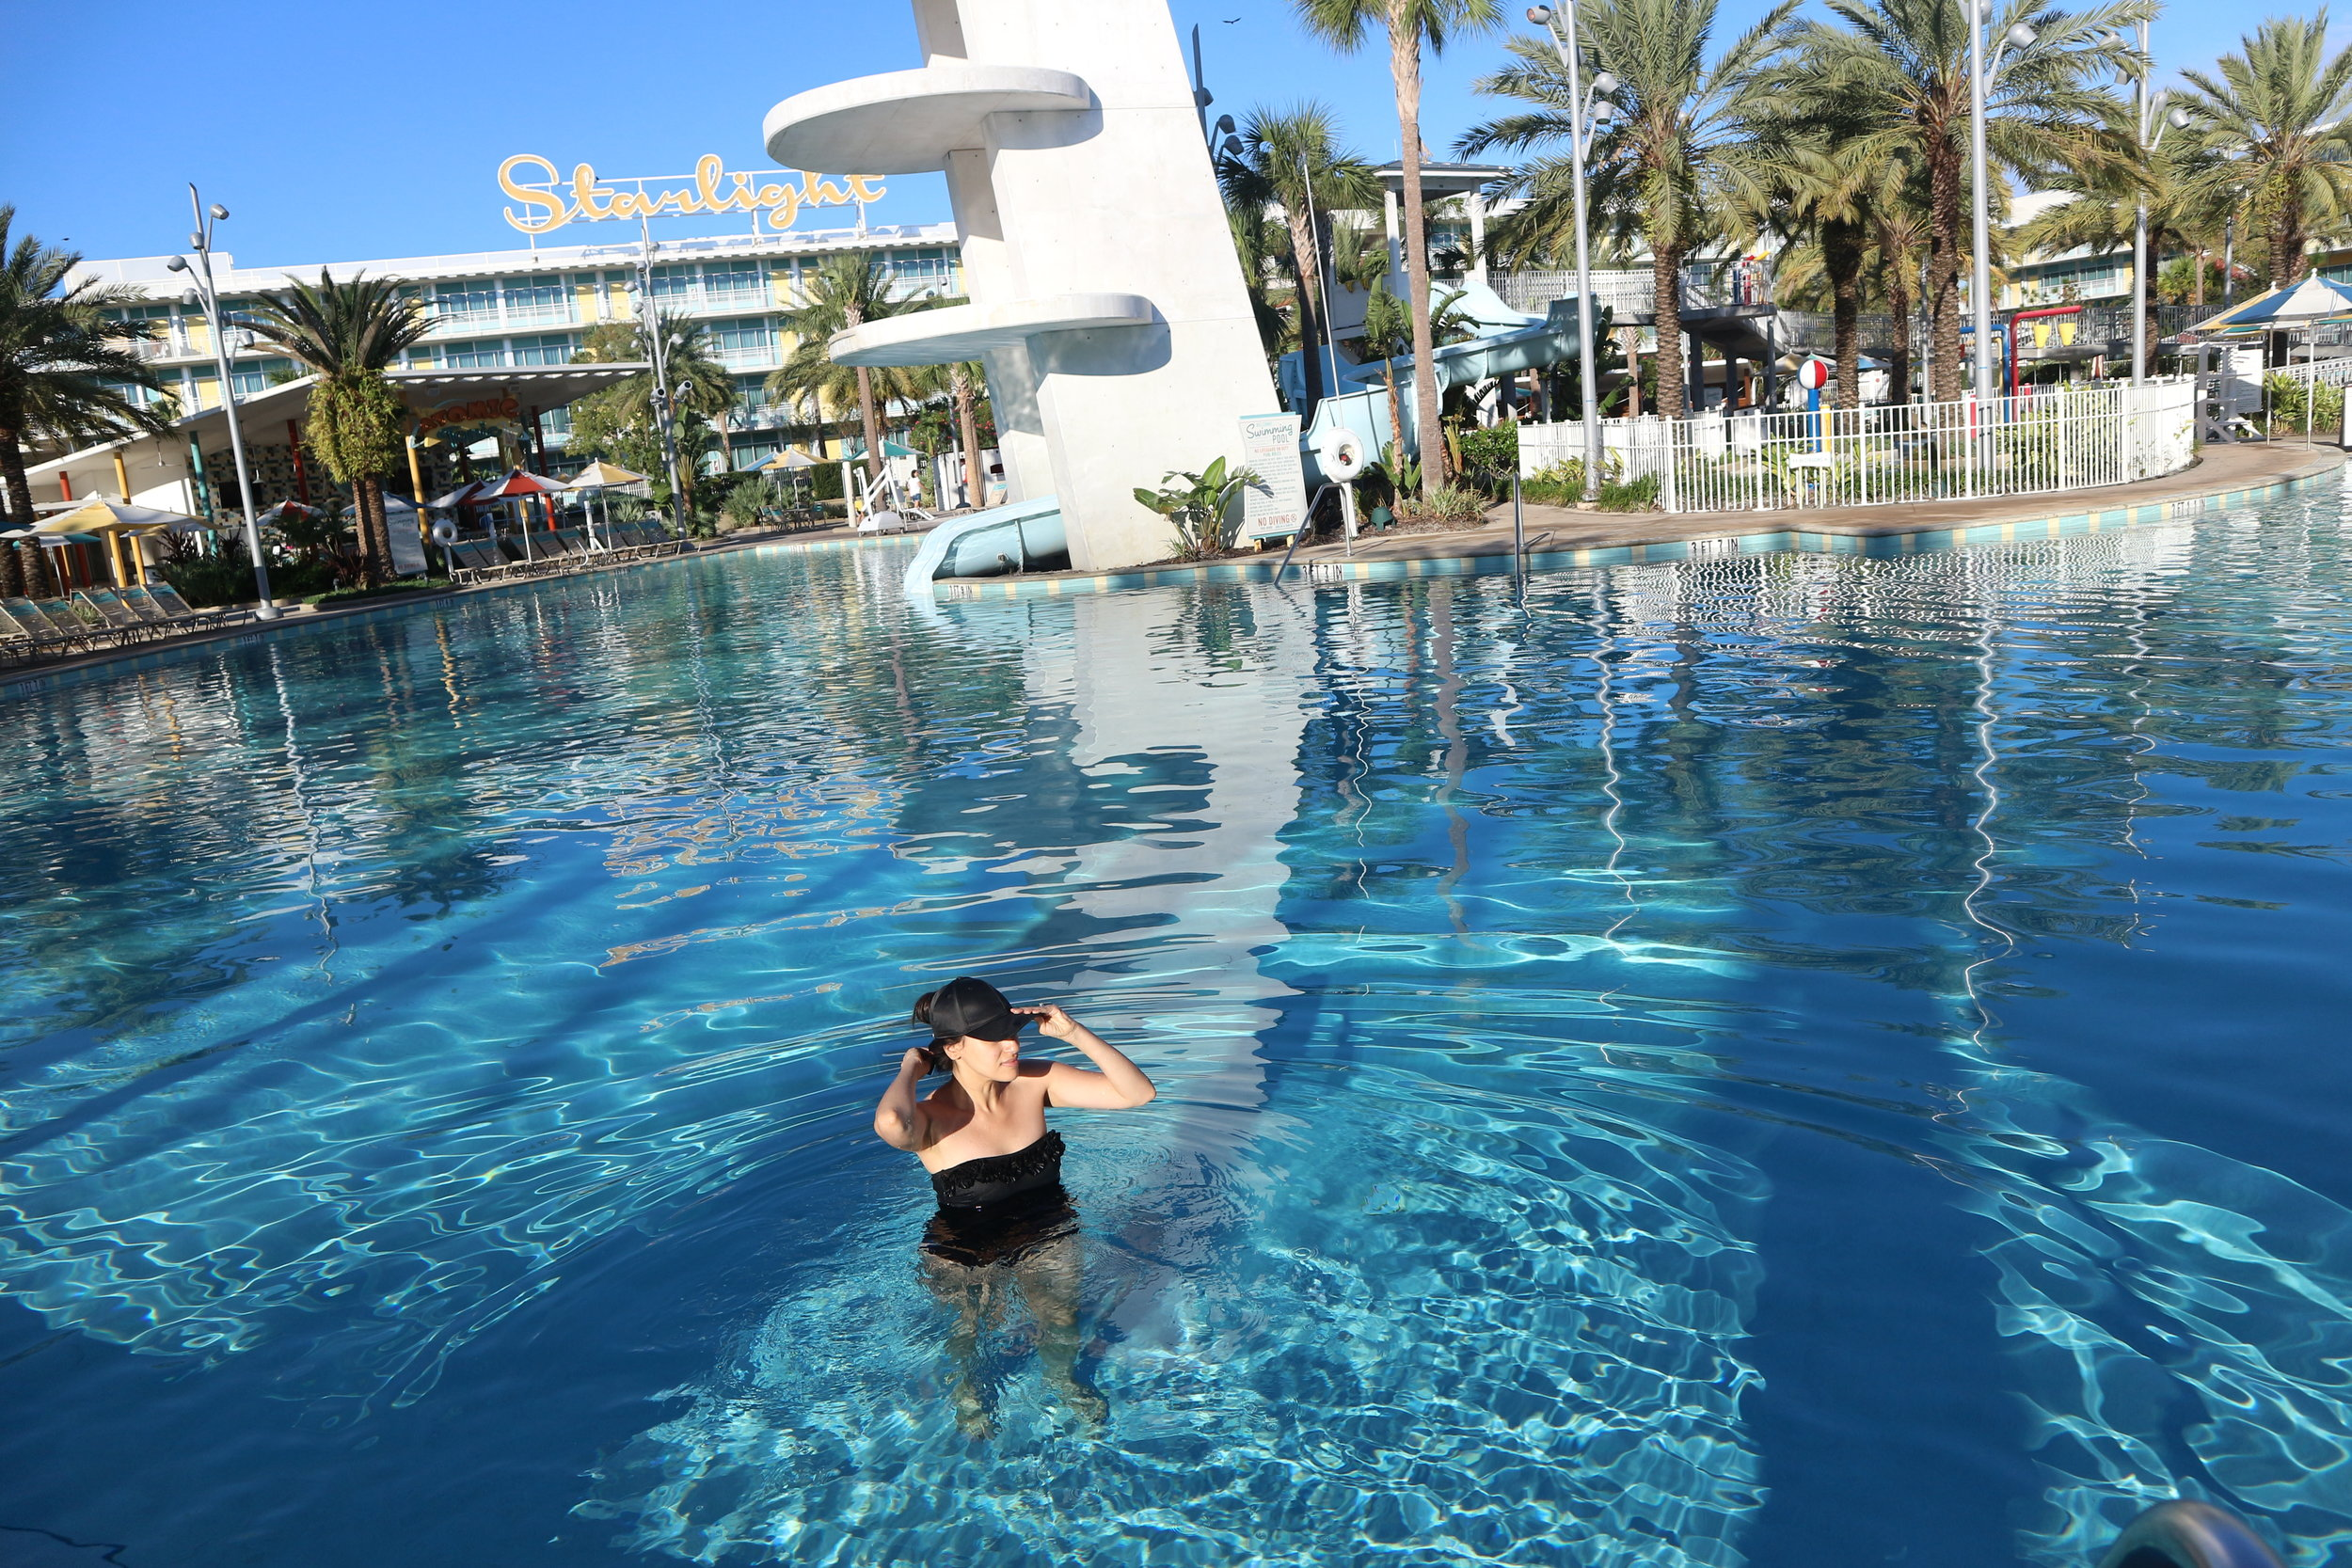 universal studios florida resort.JPG